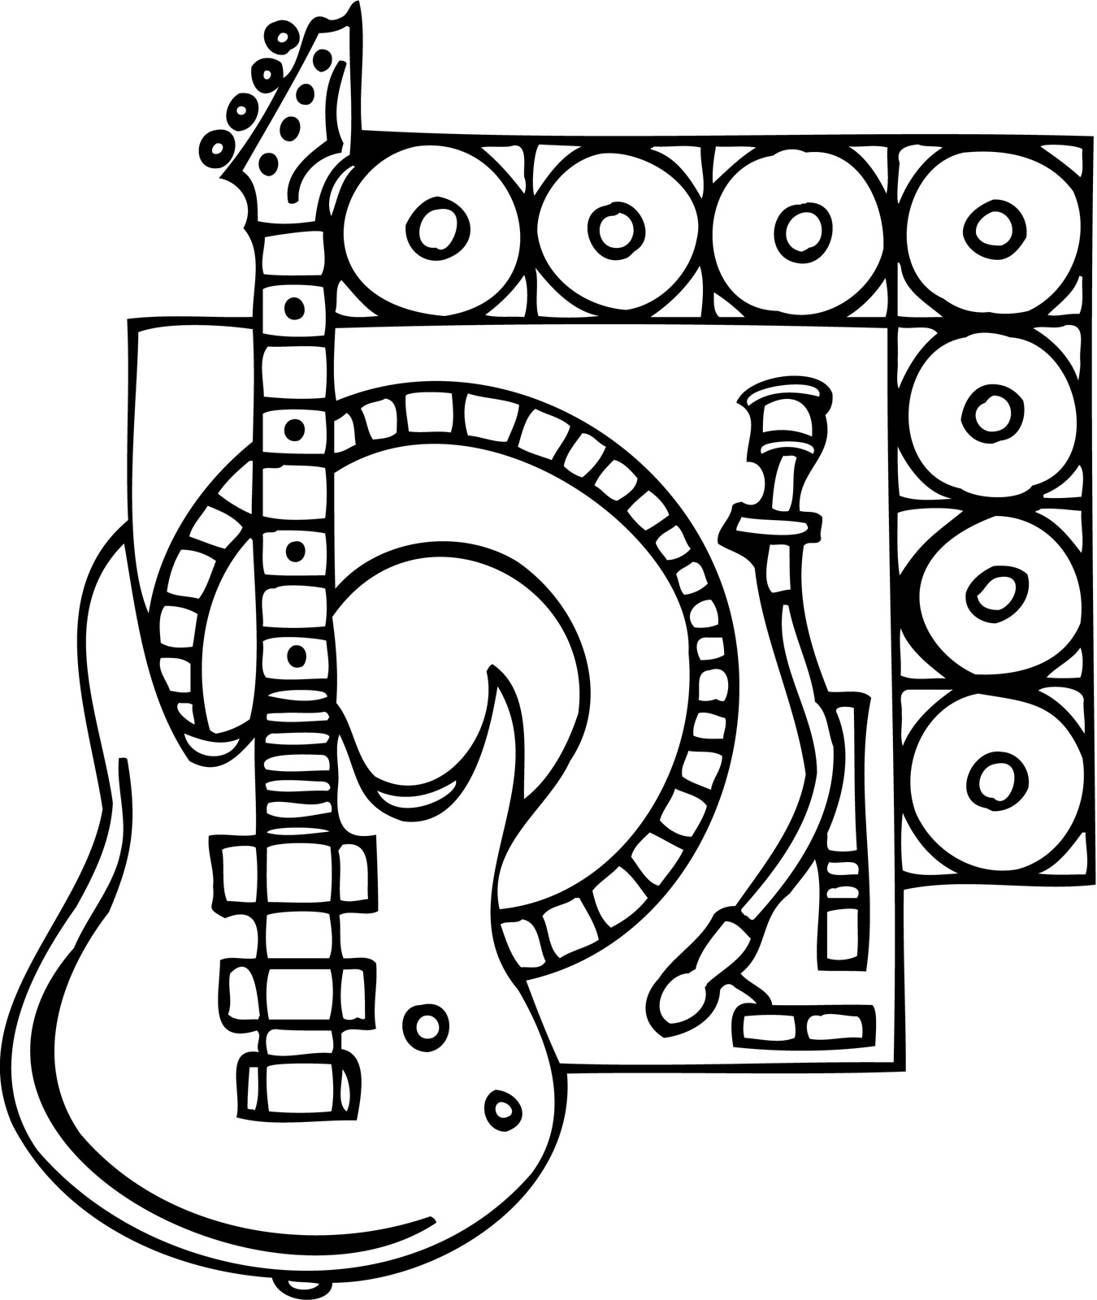 MUSIC-053